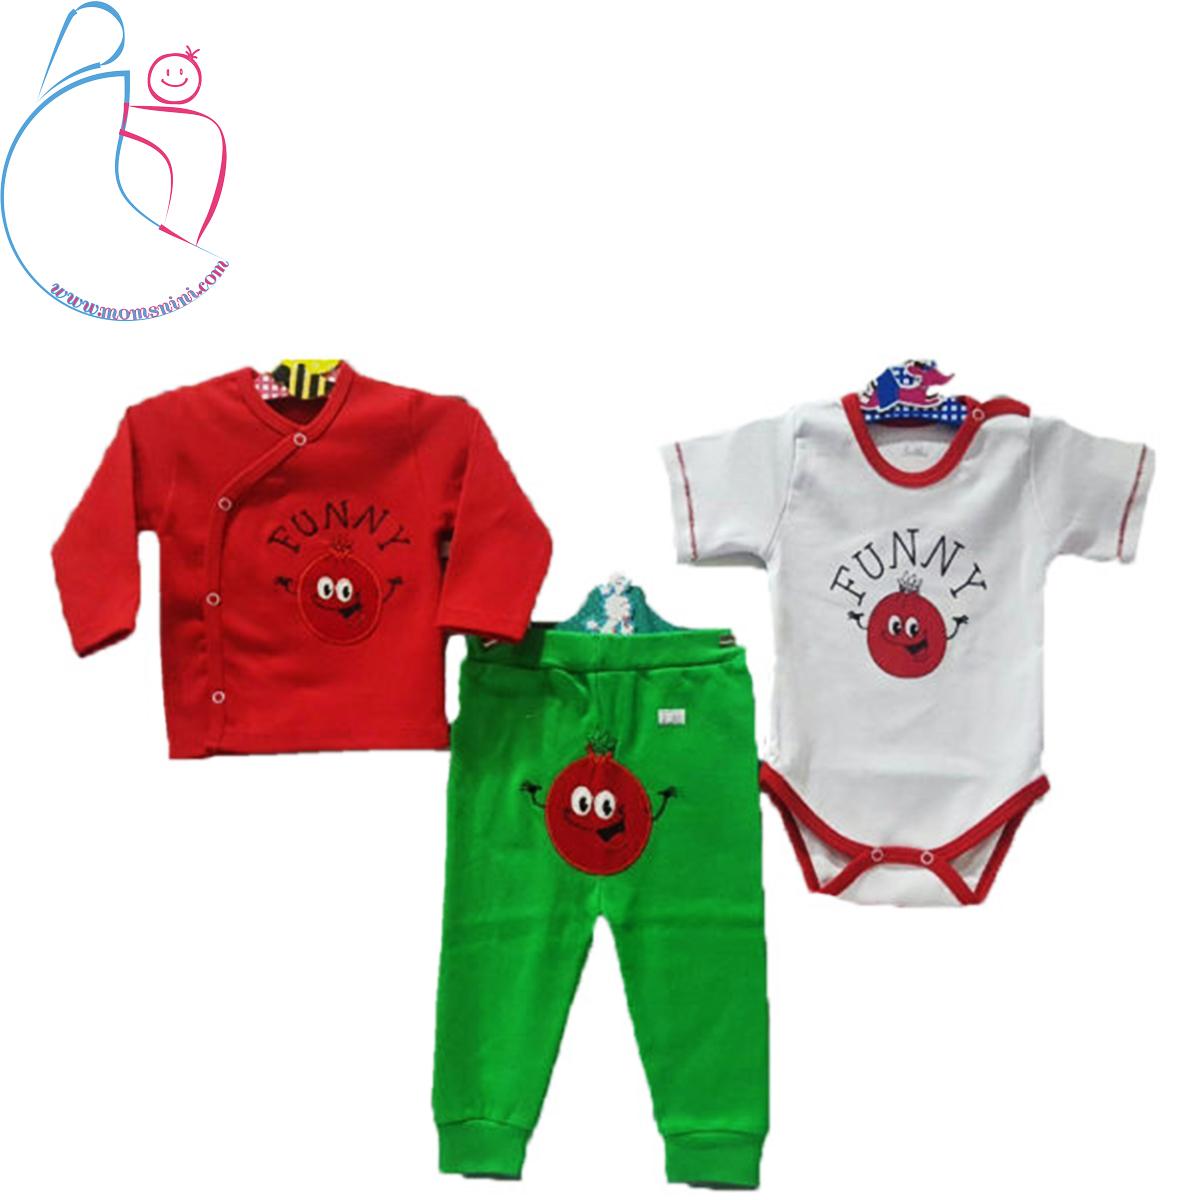 ست ۳ تکه لباس کودک Good mark طرح انار